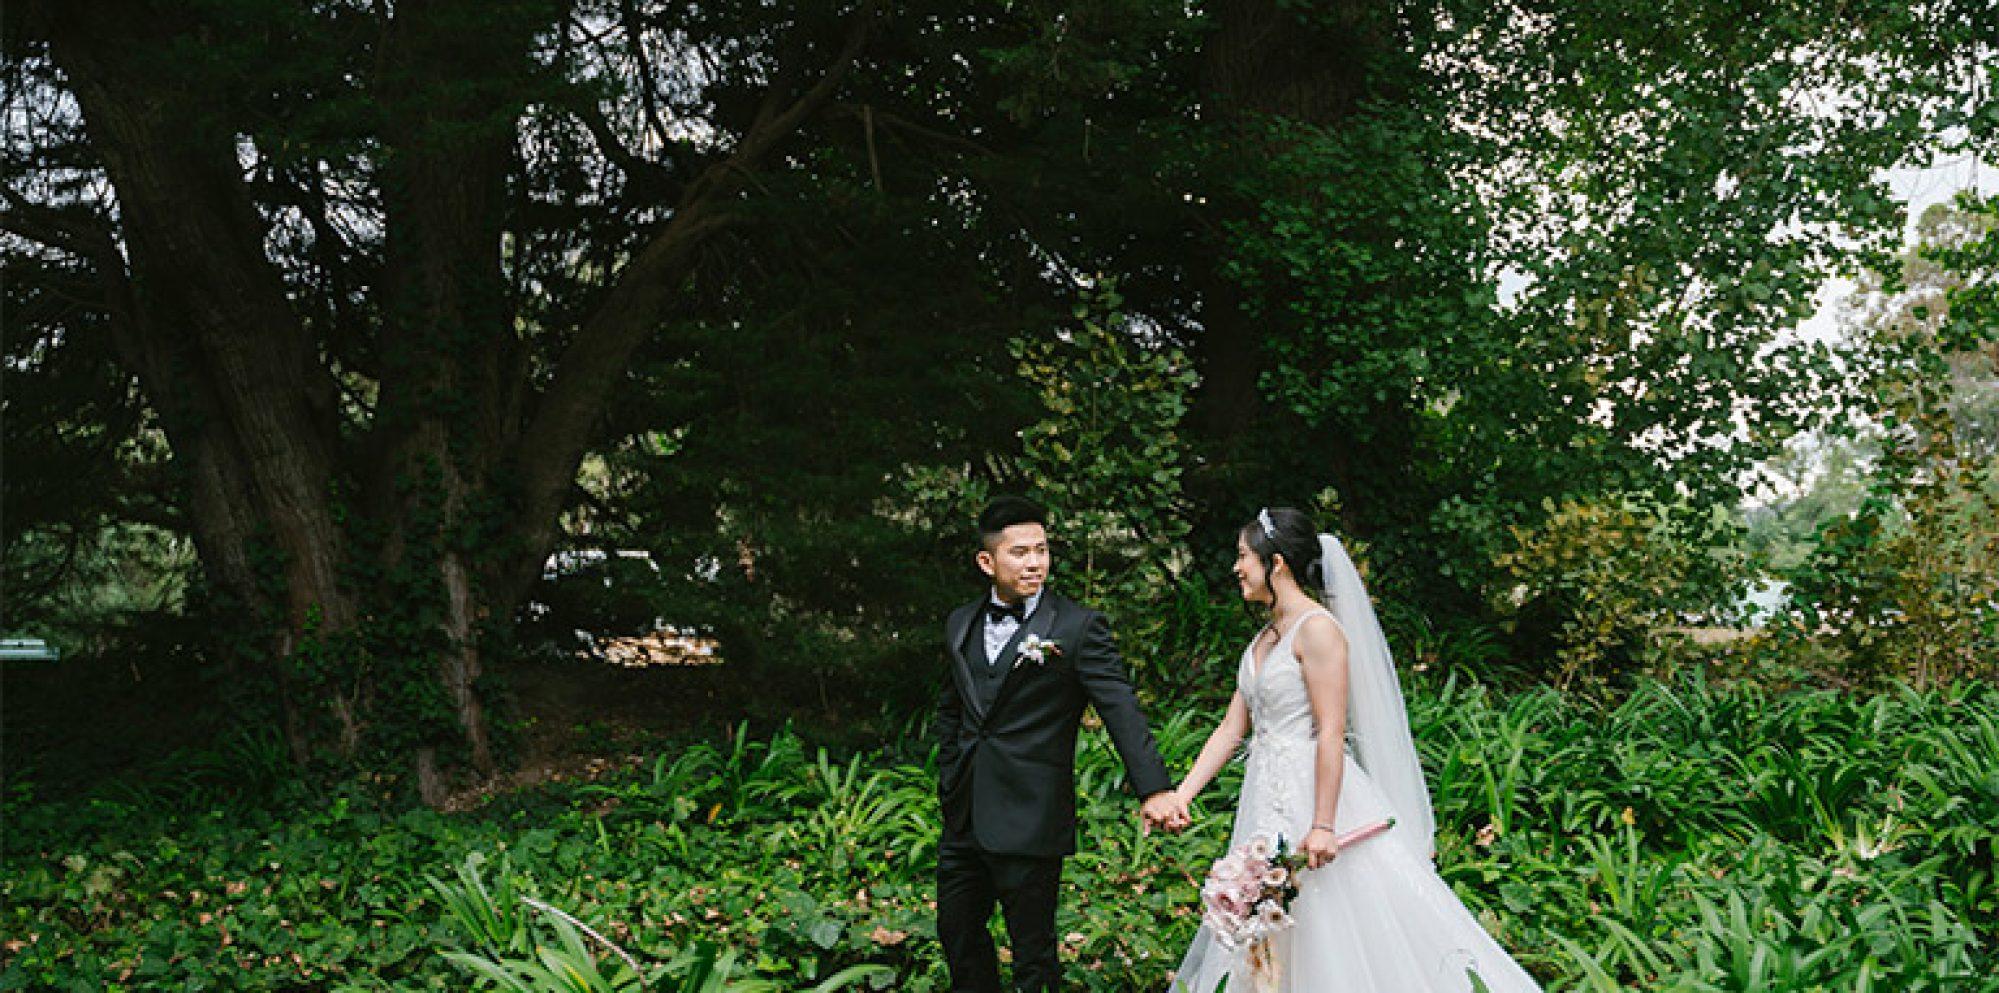 Anita & wilson wedding photography @ leonda by the yarra